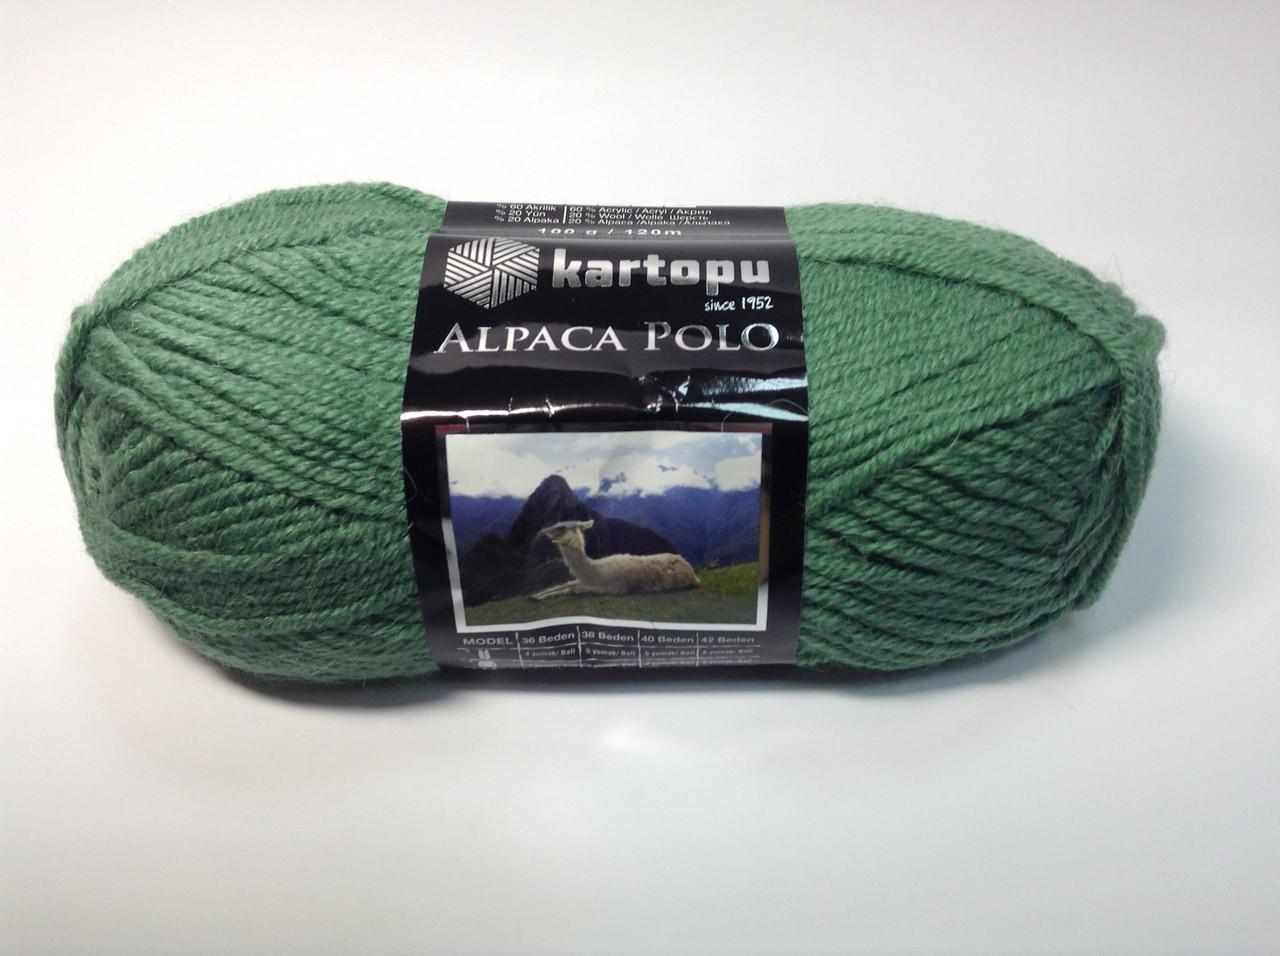 Пряжа alpaca polo - цвет зеленый